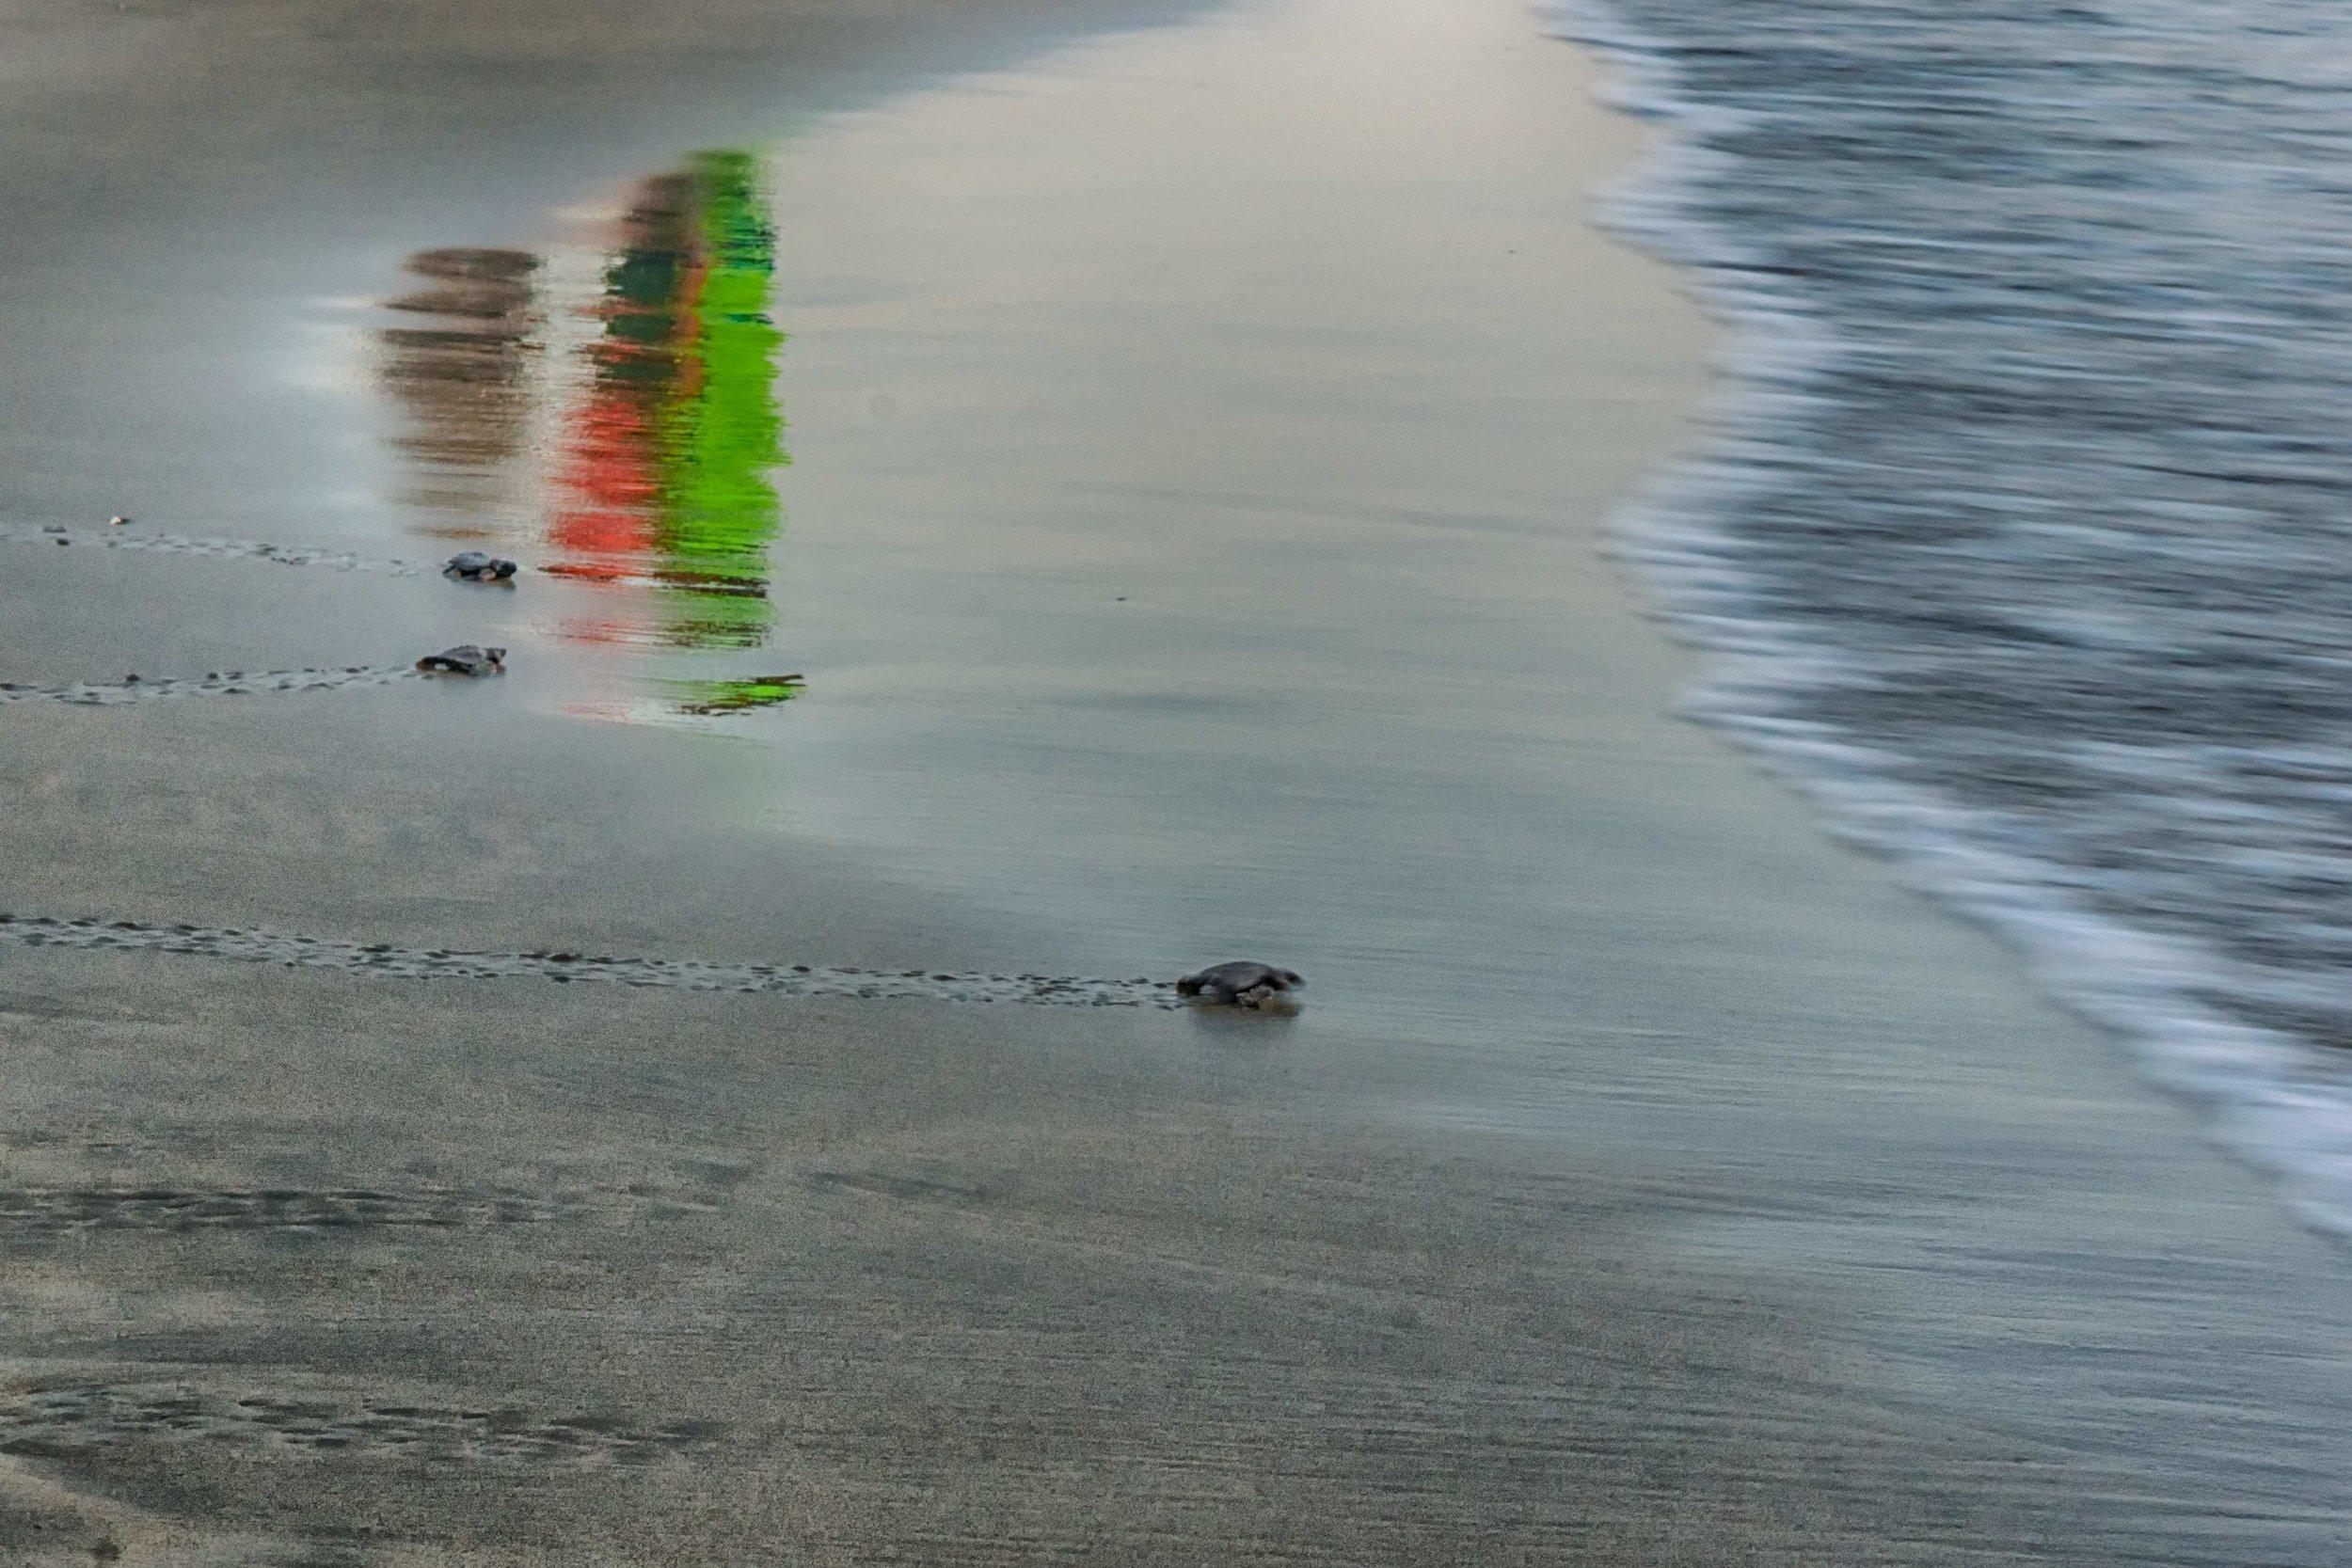 Three Turtles returning to the ocean as three people watch